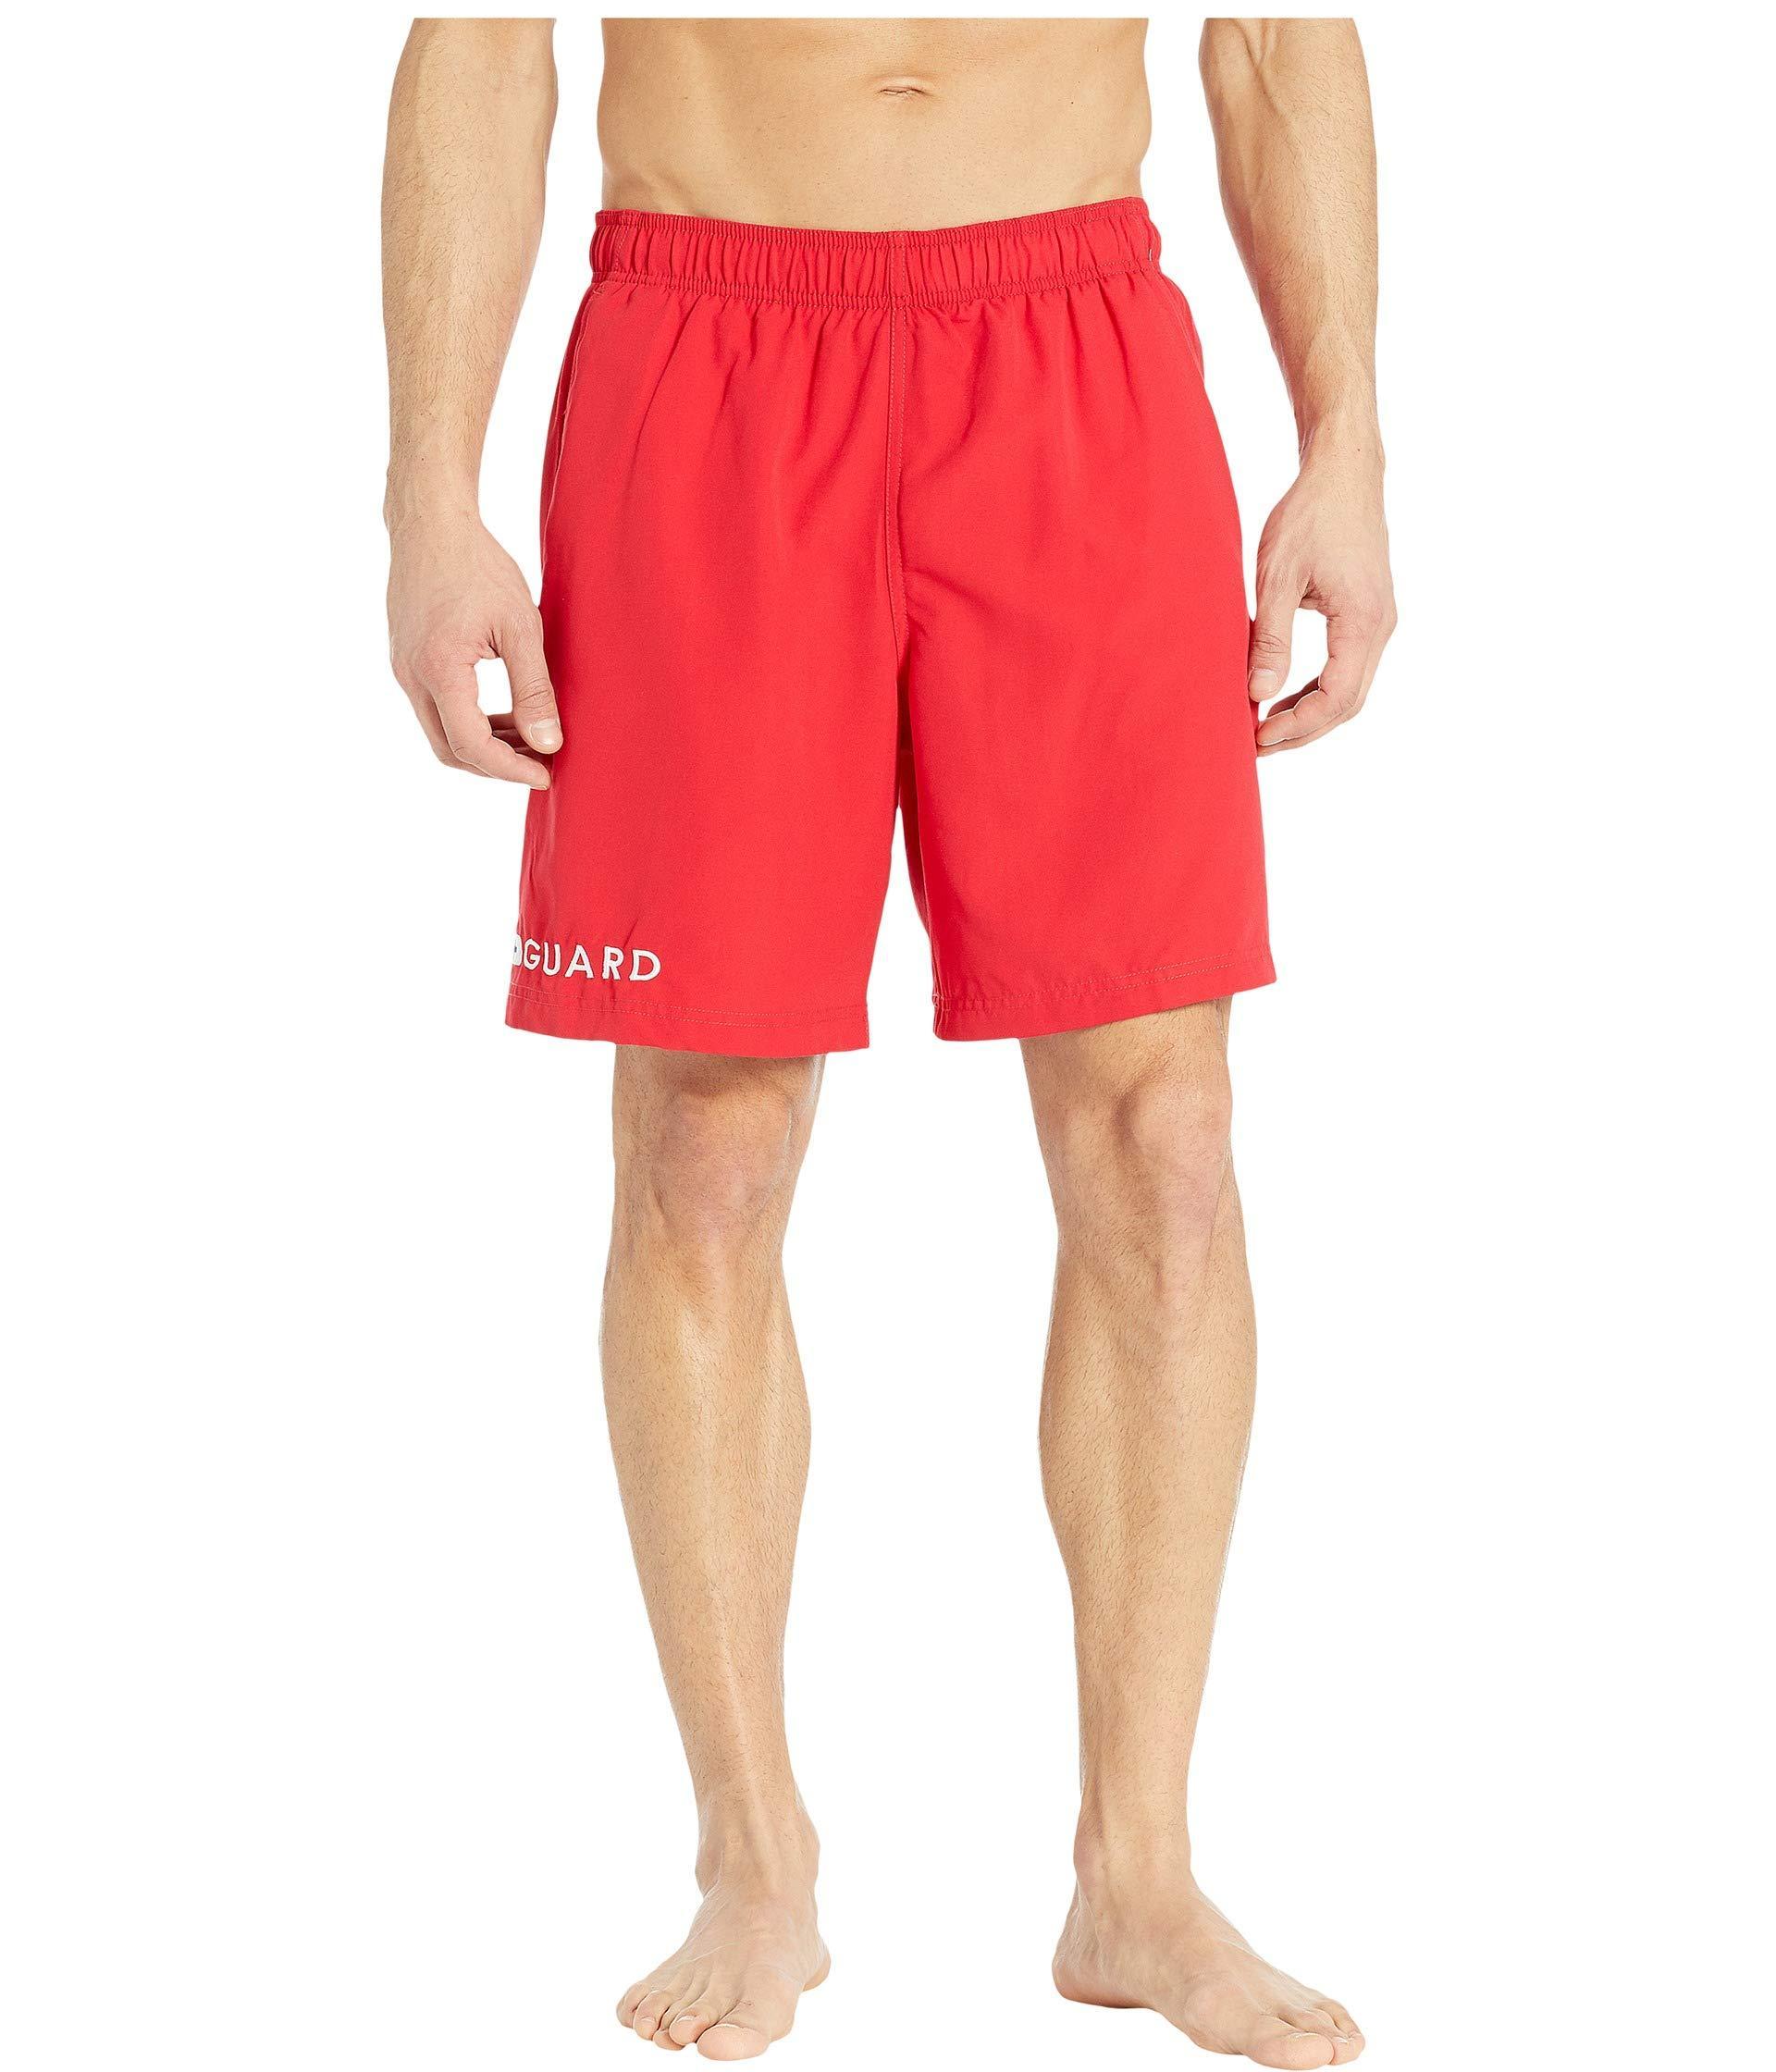 3dd2713cf8 Speedo 19 Guard Volley Shorts ( Red) Men's Swimwear in Red for Men ...